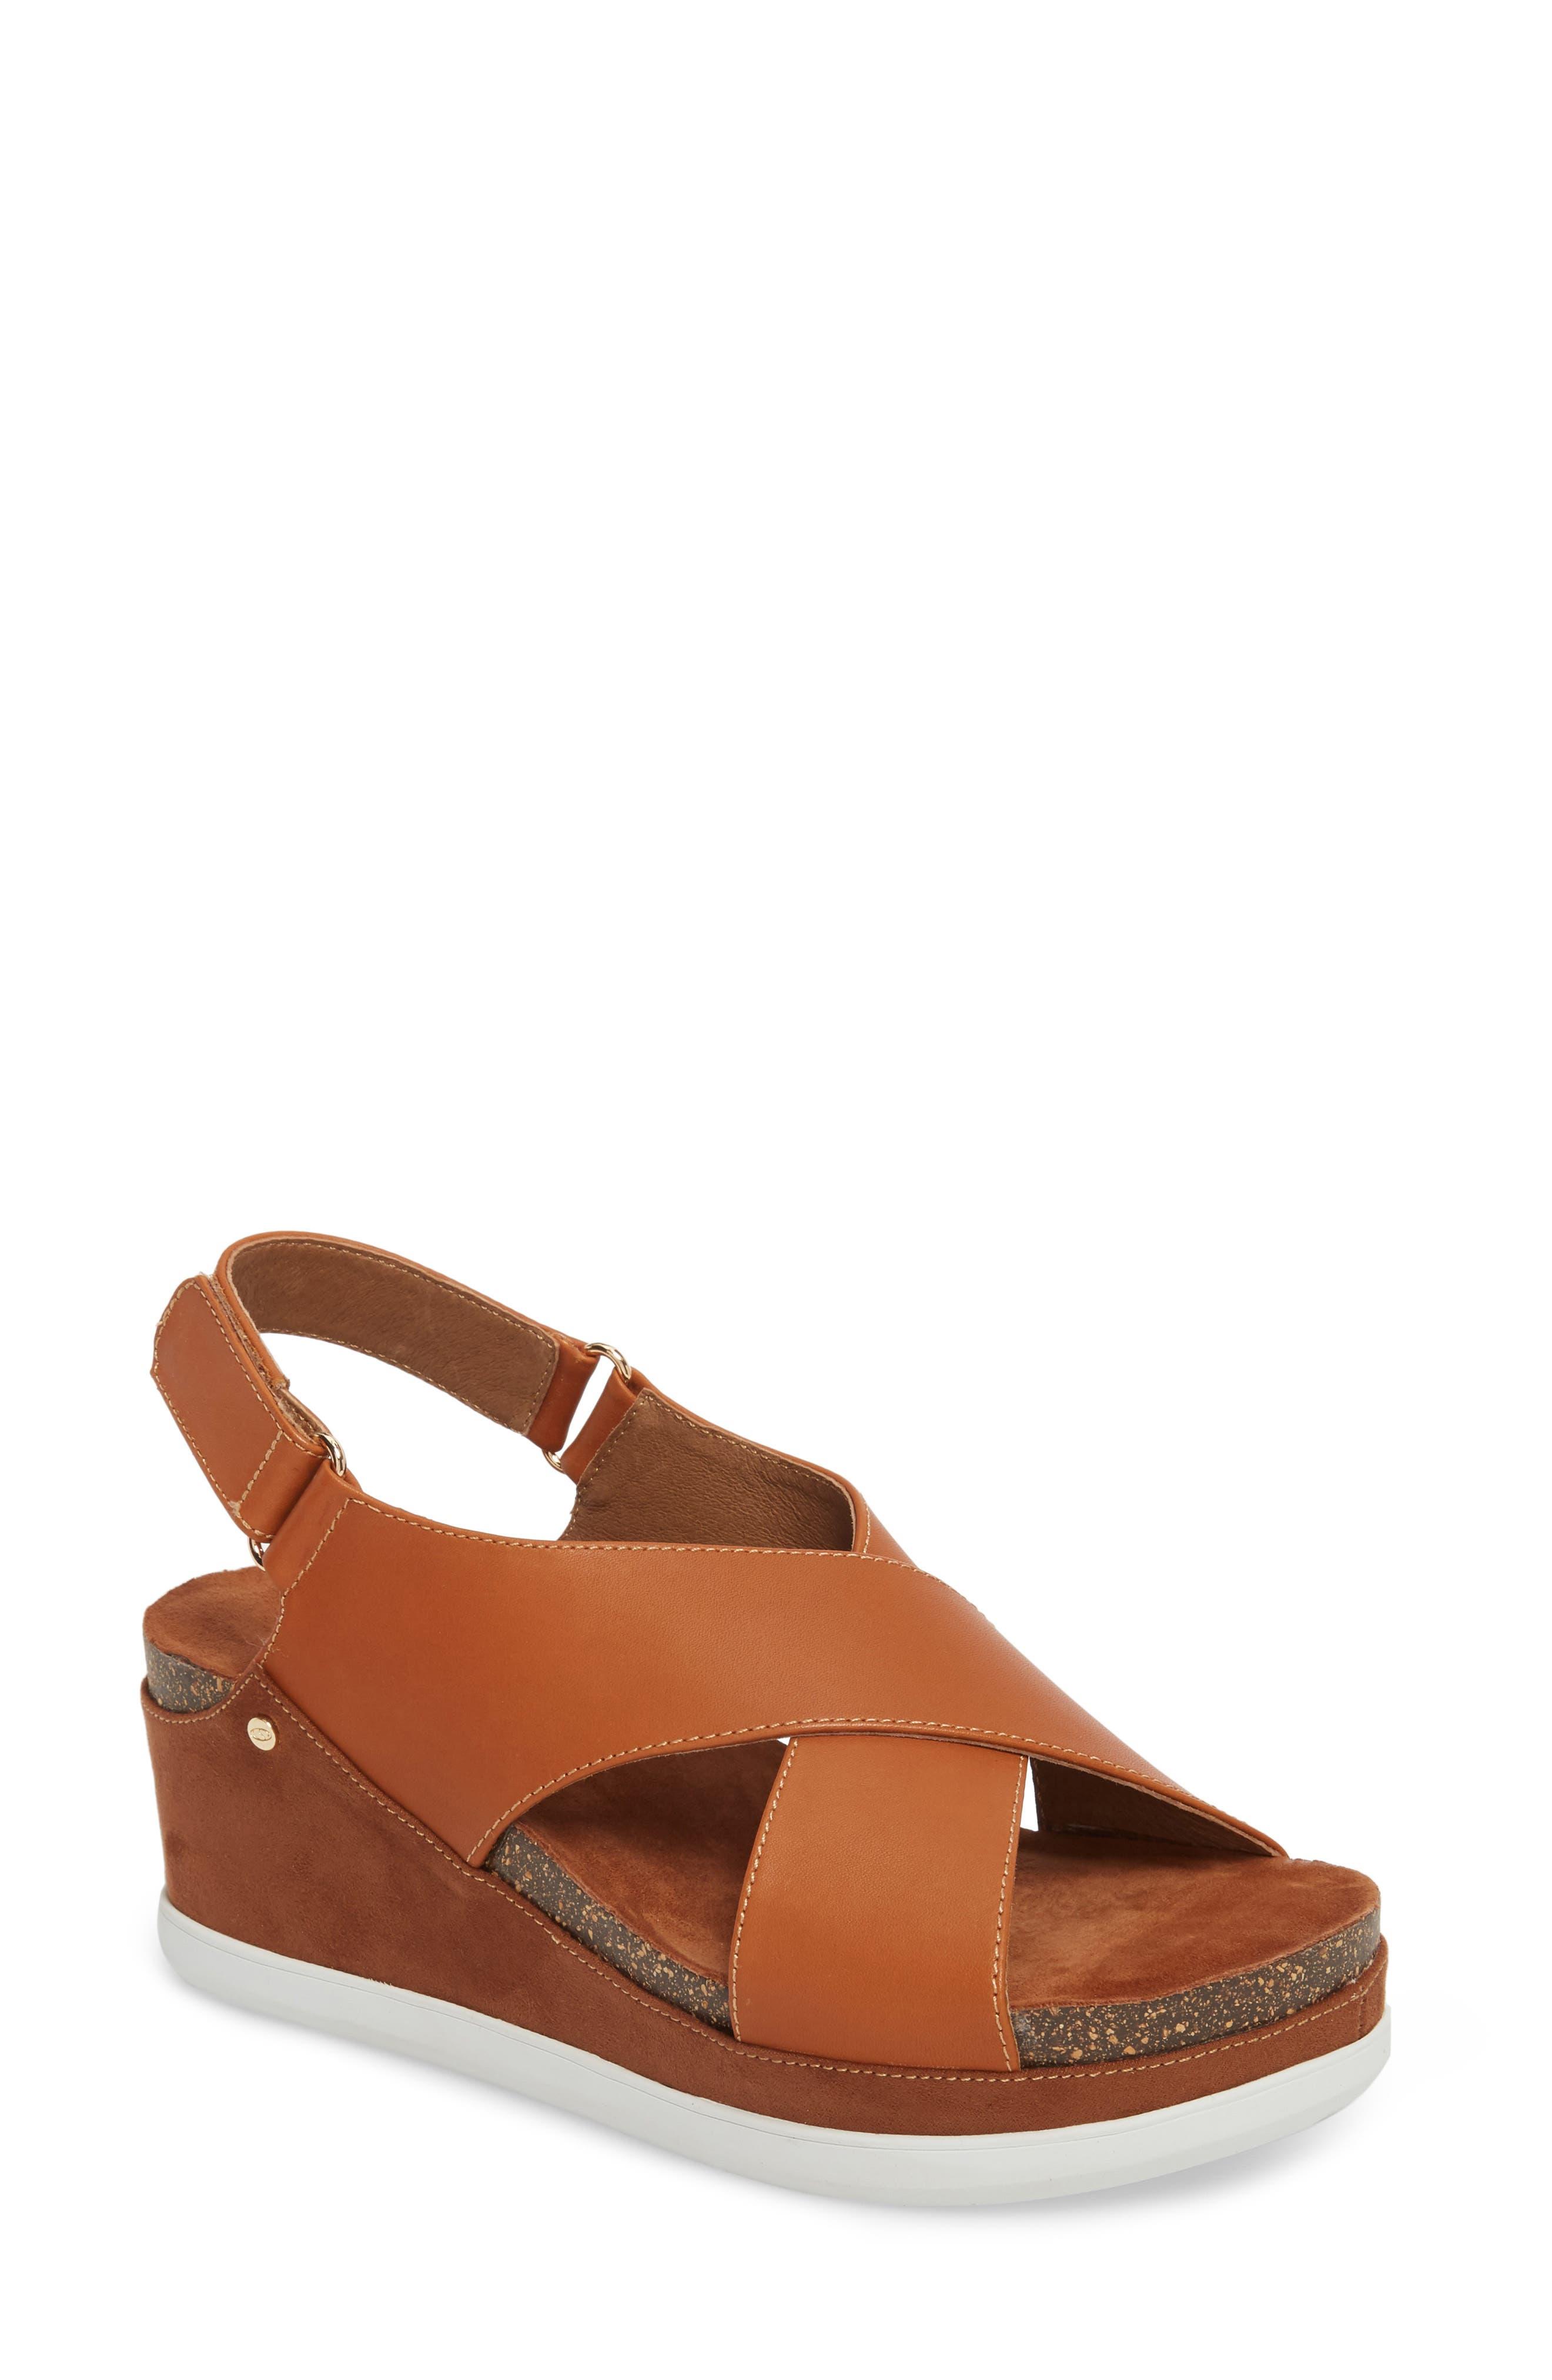 Sudini Pamela Slingback Wedge Sandal, Brown